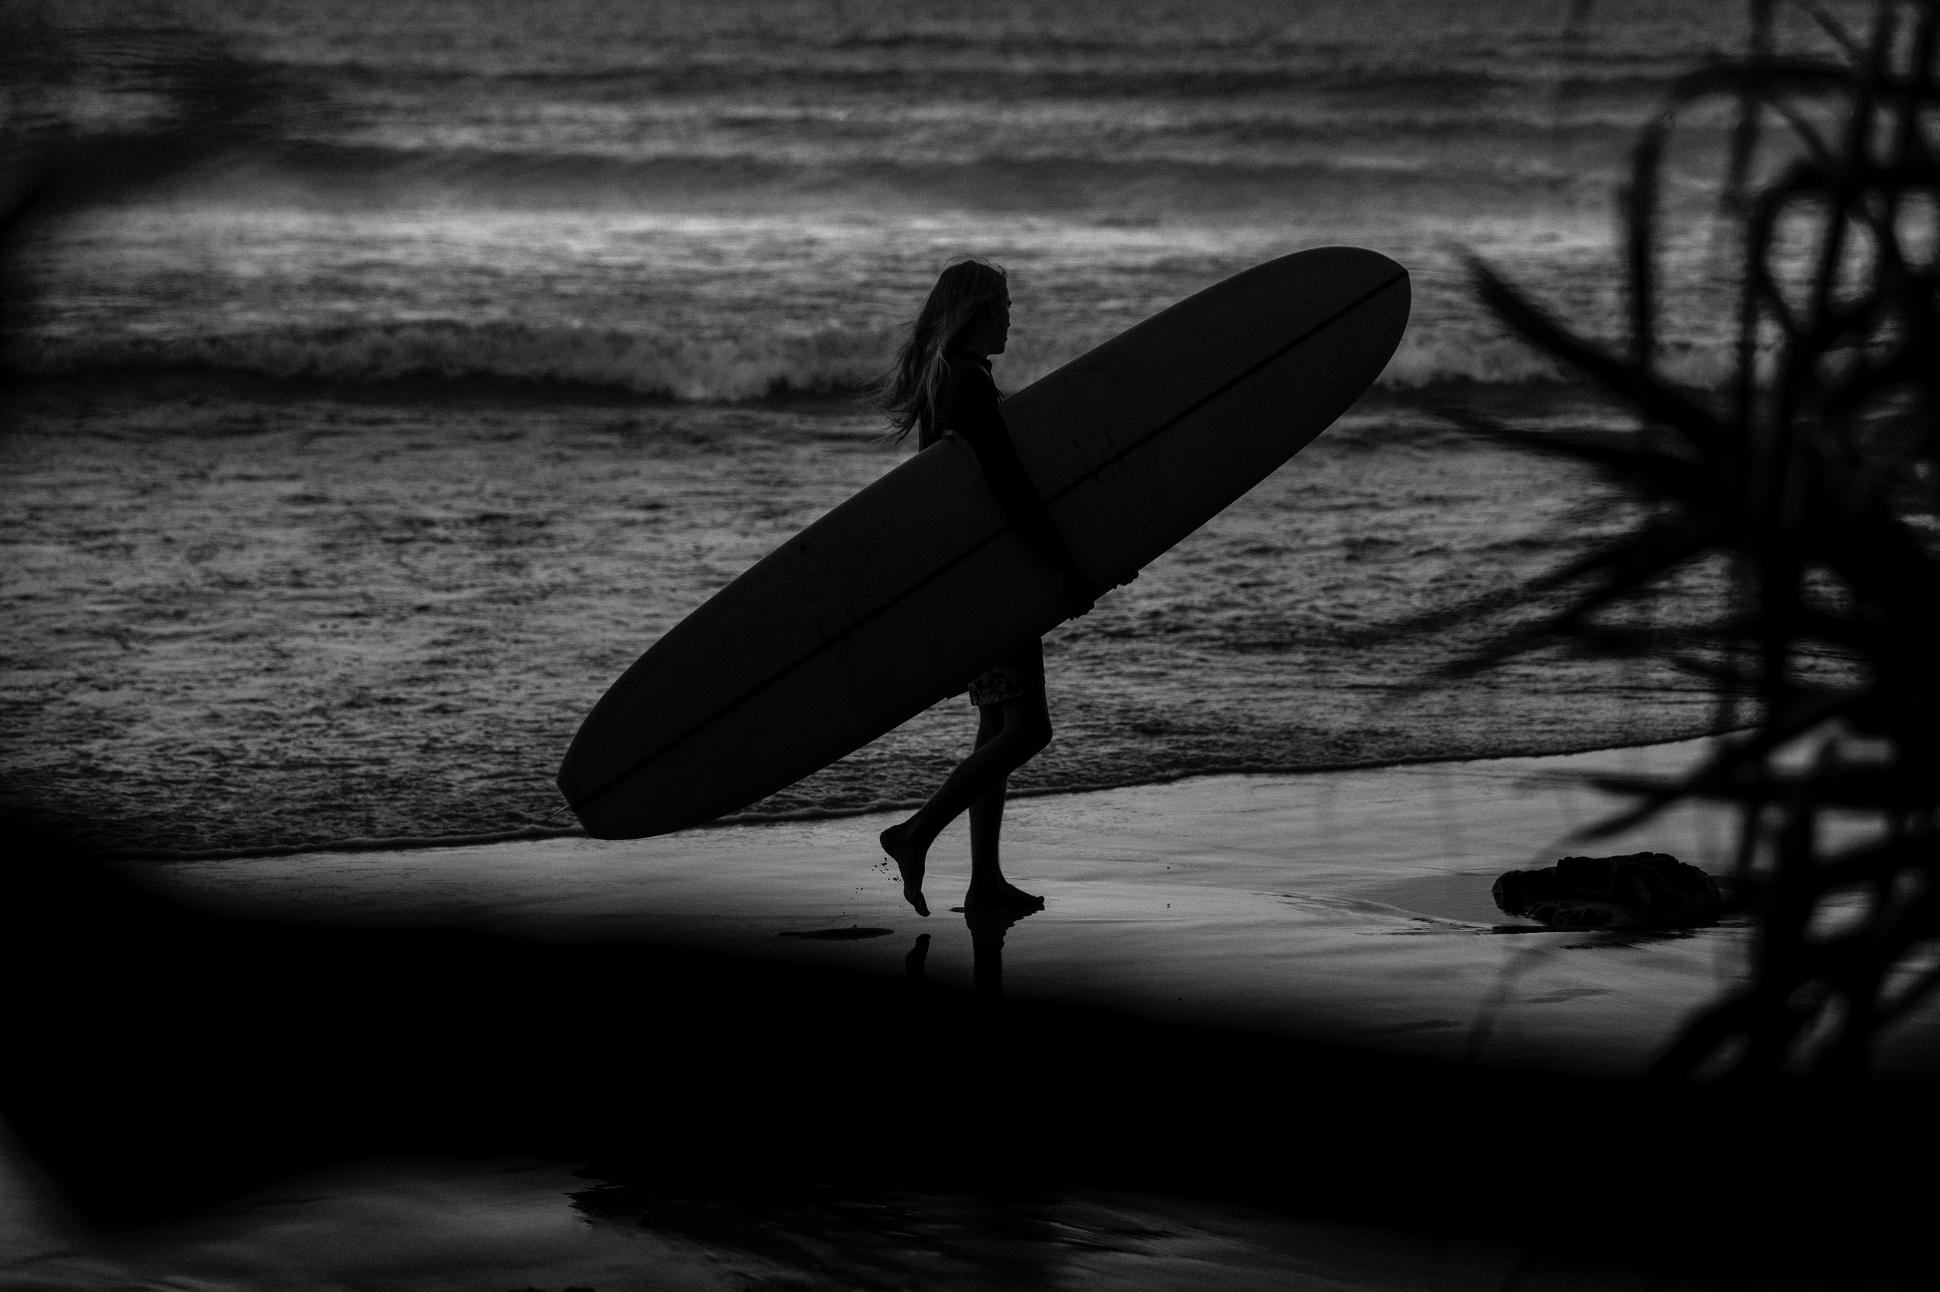 Fabien_voileau_salt_water_byron_bay_surf_Jye_whyatt_1